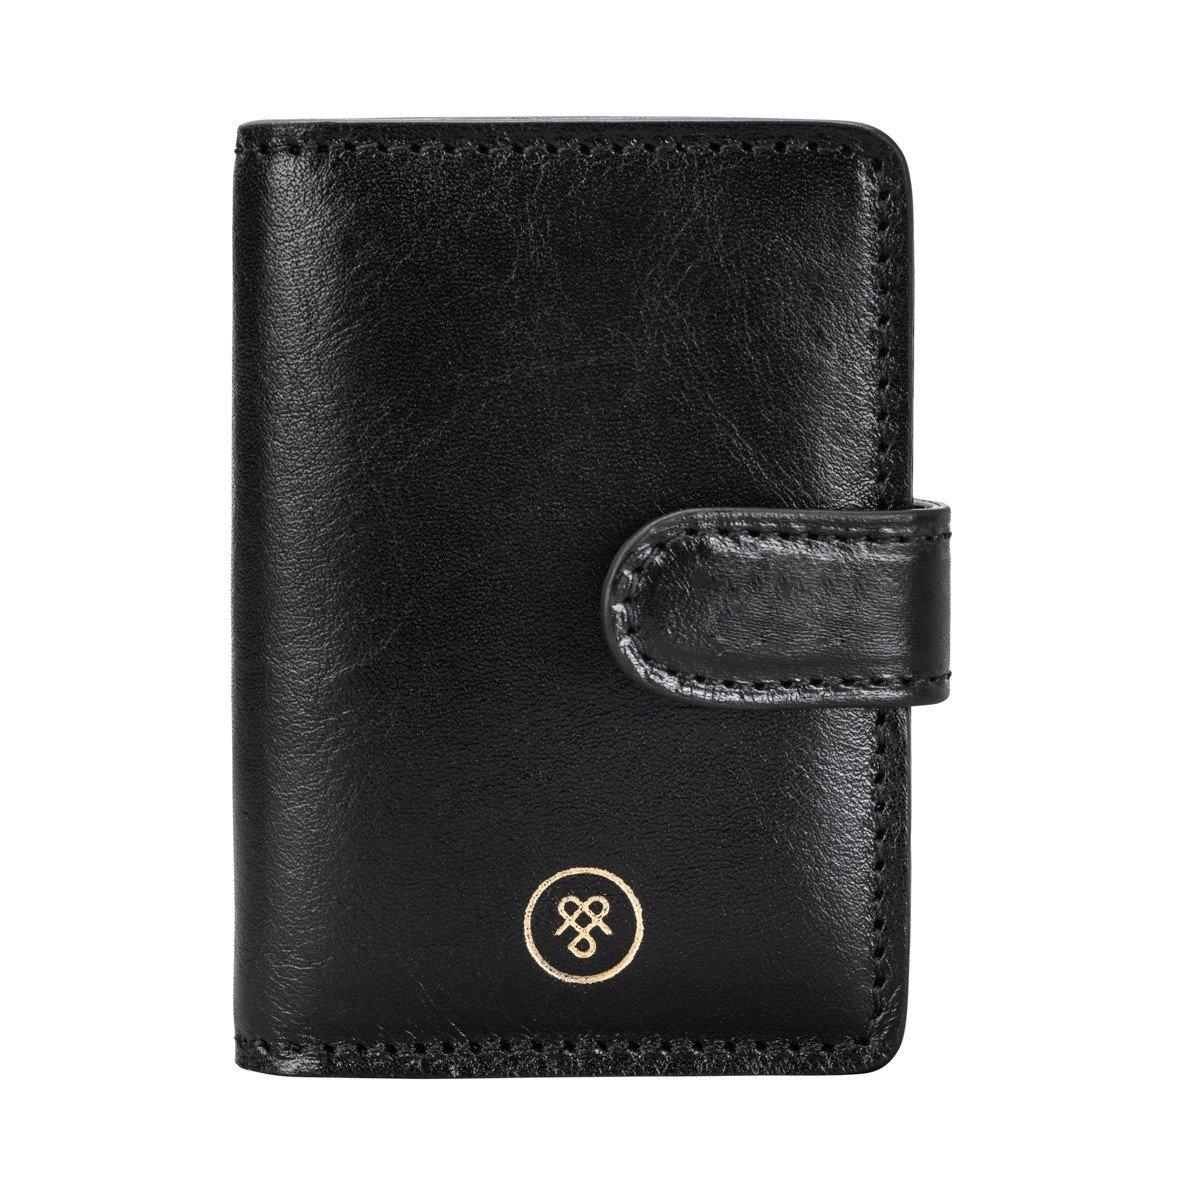 Maxwell Scott Personalized Premium Black Handcrafted Italian Full Grain Leather Mini Pocket Agenda (Alvito) by Maxwell Scott Bags (Image #1)